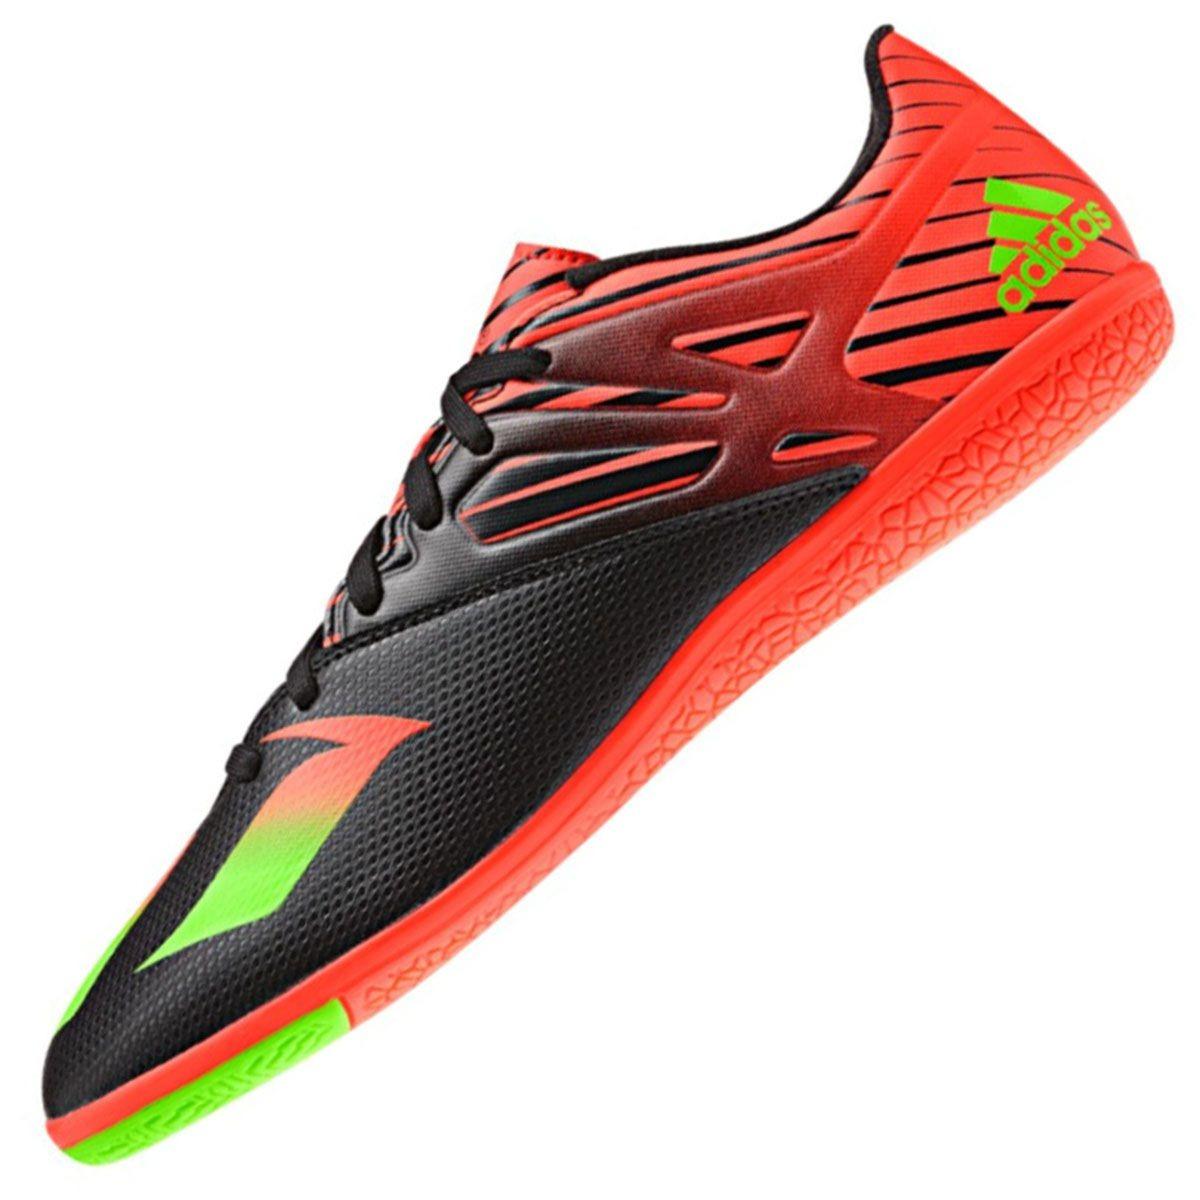 Chuteira Tênis De Futsal adidas Messi 15.3 Origianl+ Nf - R  200 447e1f61d61f4